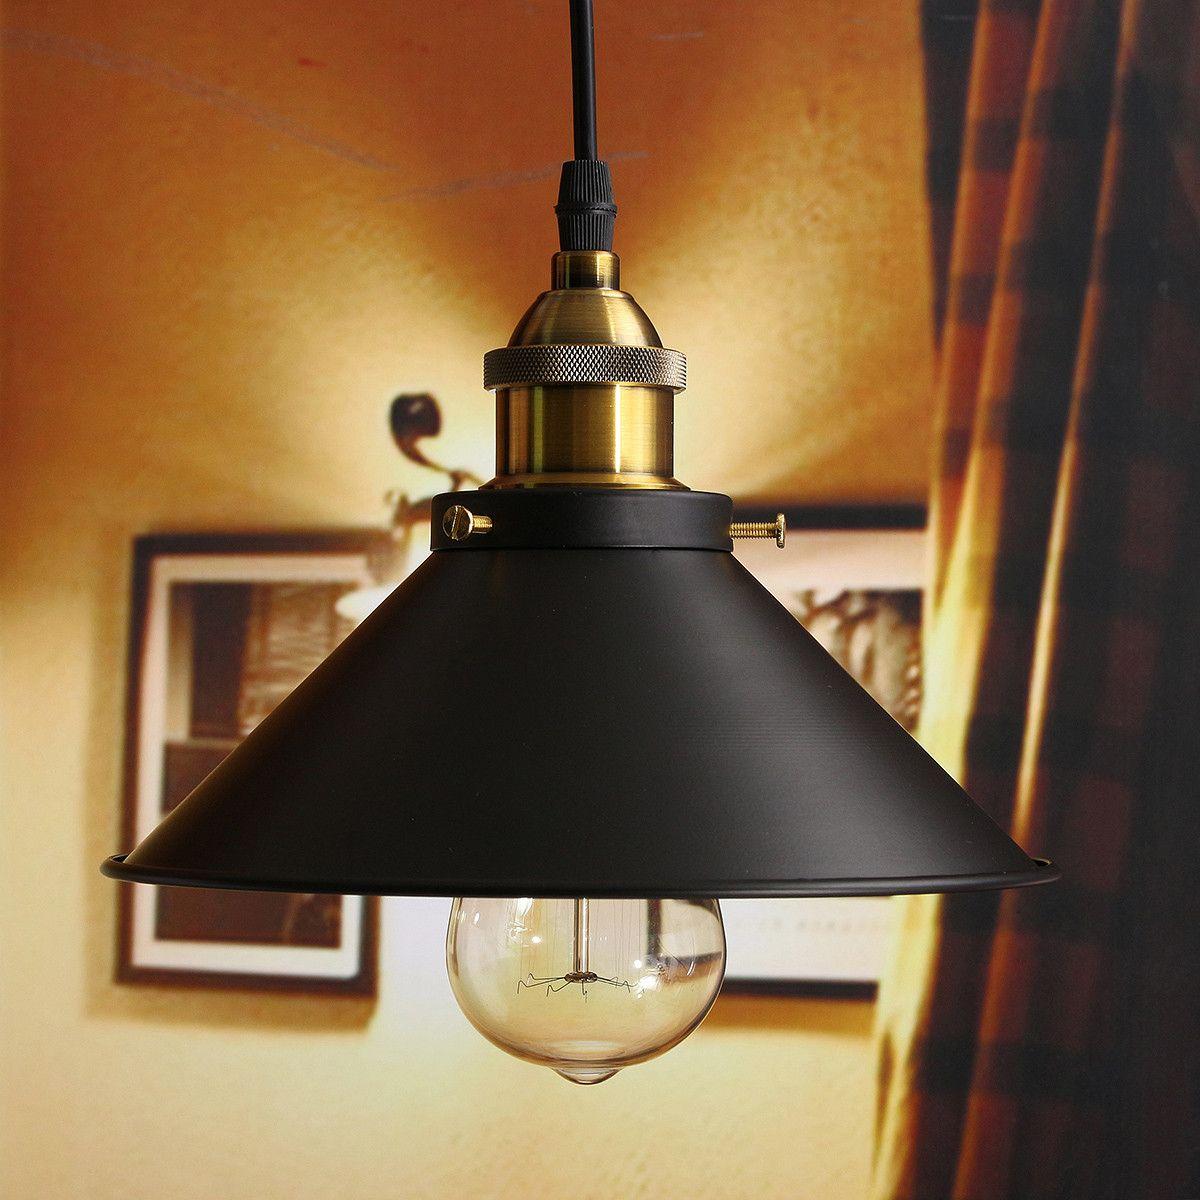 88dc184518c 2019 Loft Vintage Ceiling Lamp Round Retro Ceiling Light Industrial Design Edison  Bulb Antique Lampshade Ambilight Lighting Fixture From Yuancao